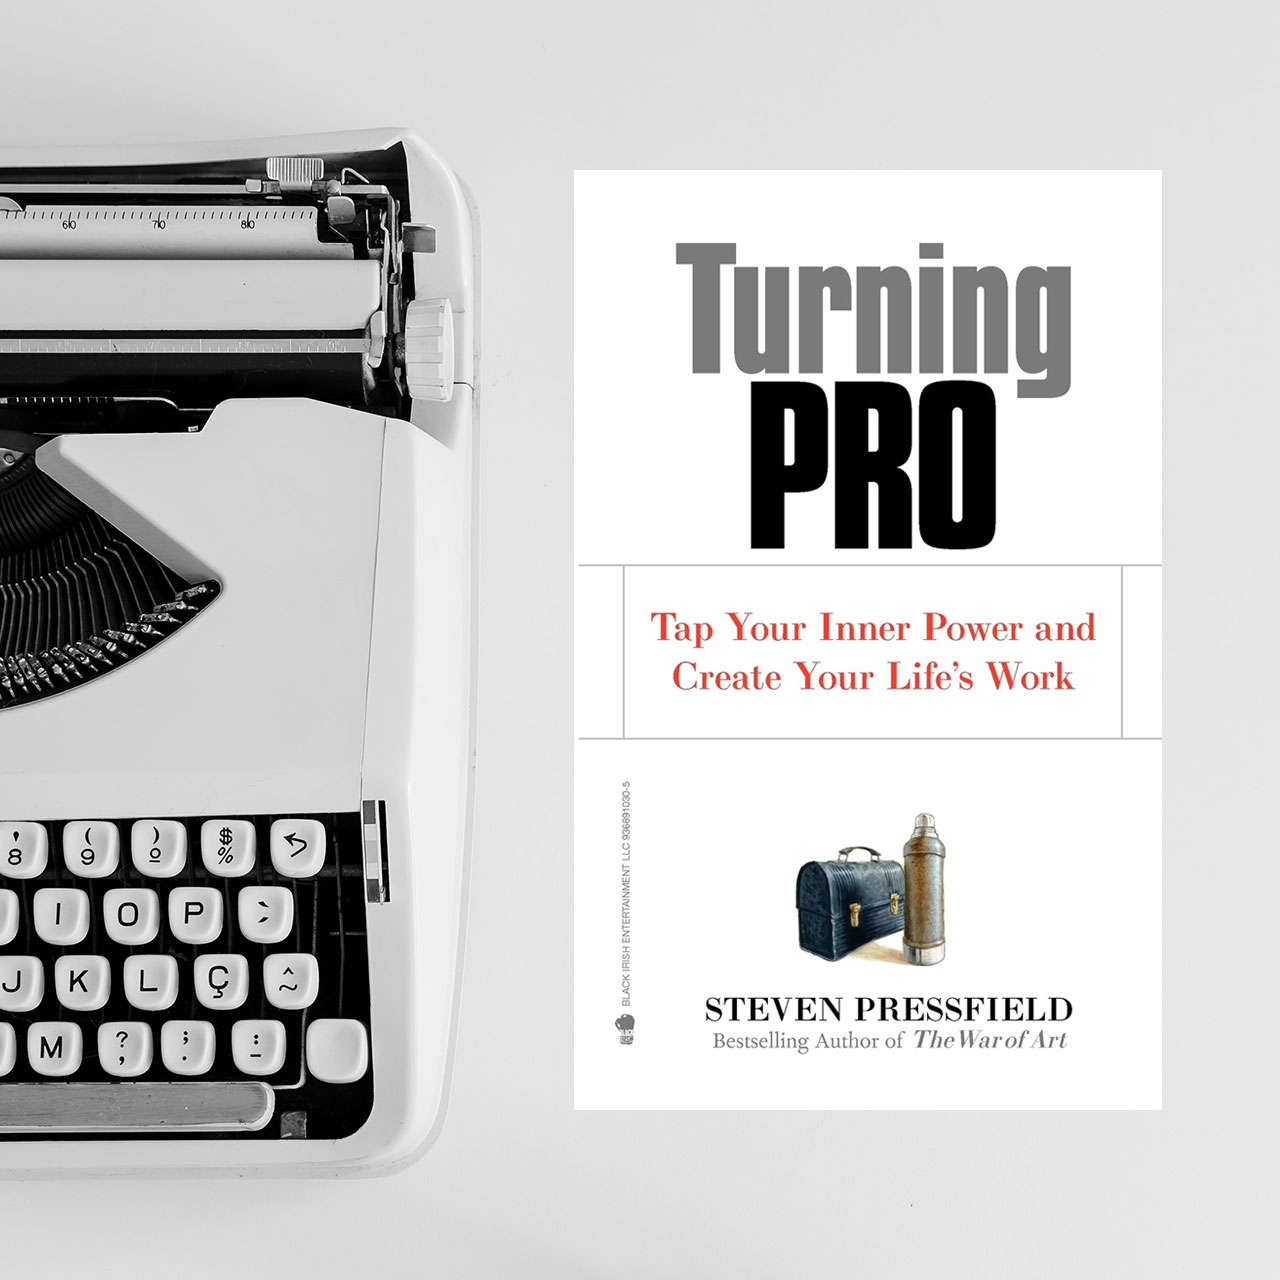 STEVEN PRESSFIELD – TURNING PRO